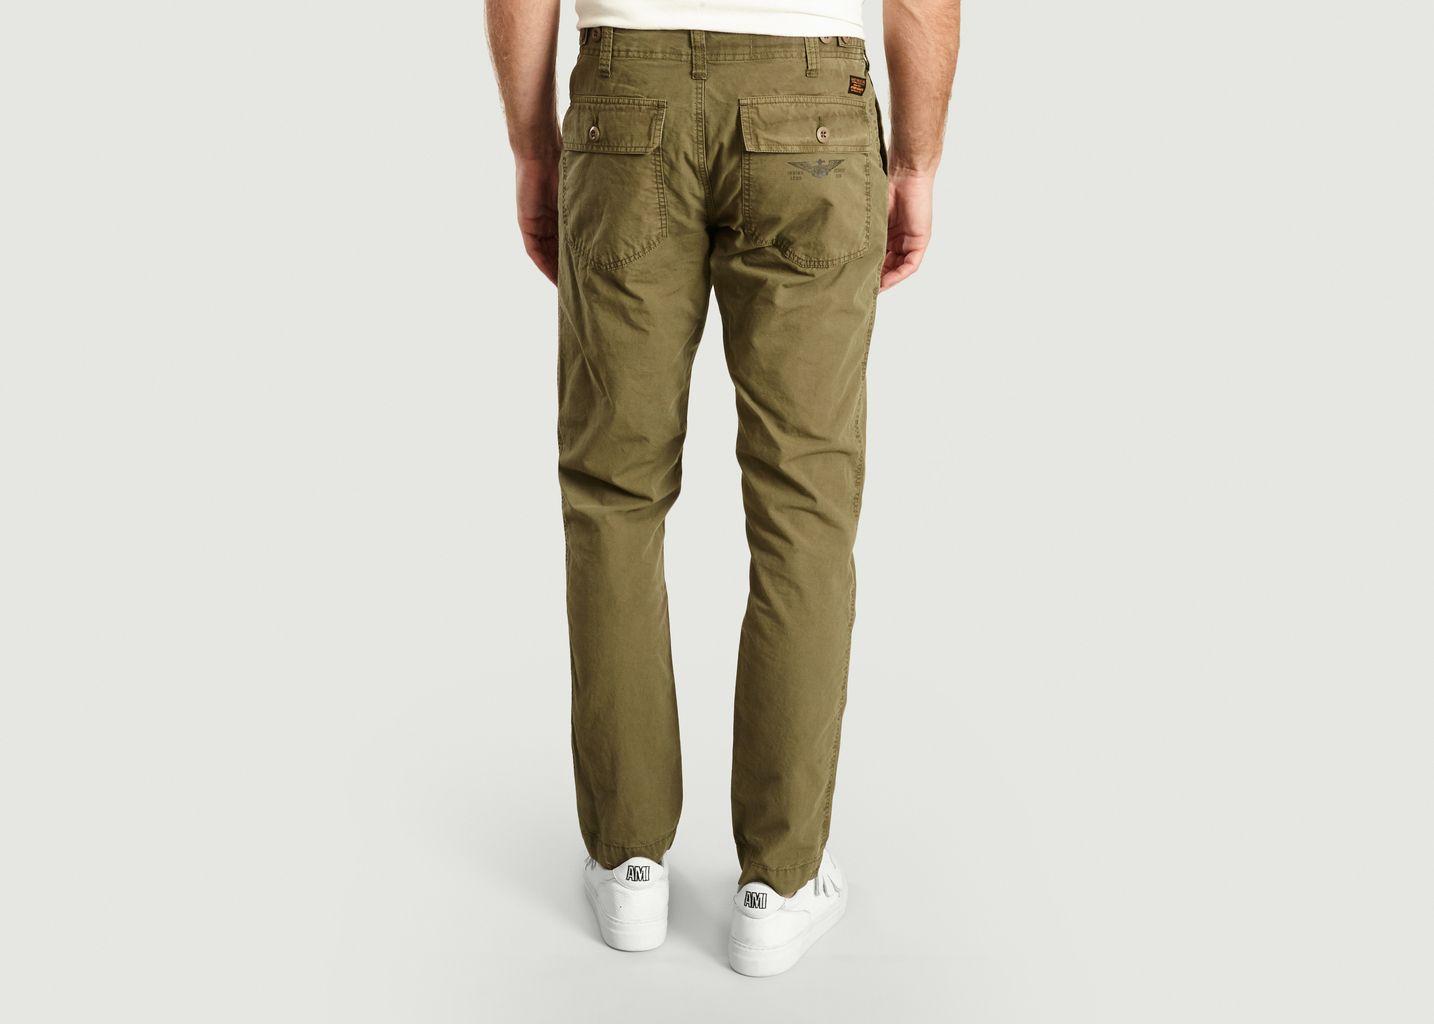 Pantalon Militaire Trrodgers 70 - Schott NYC